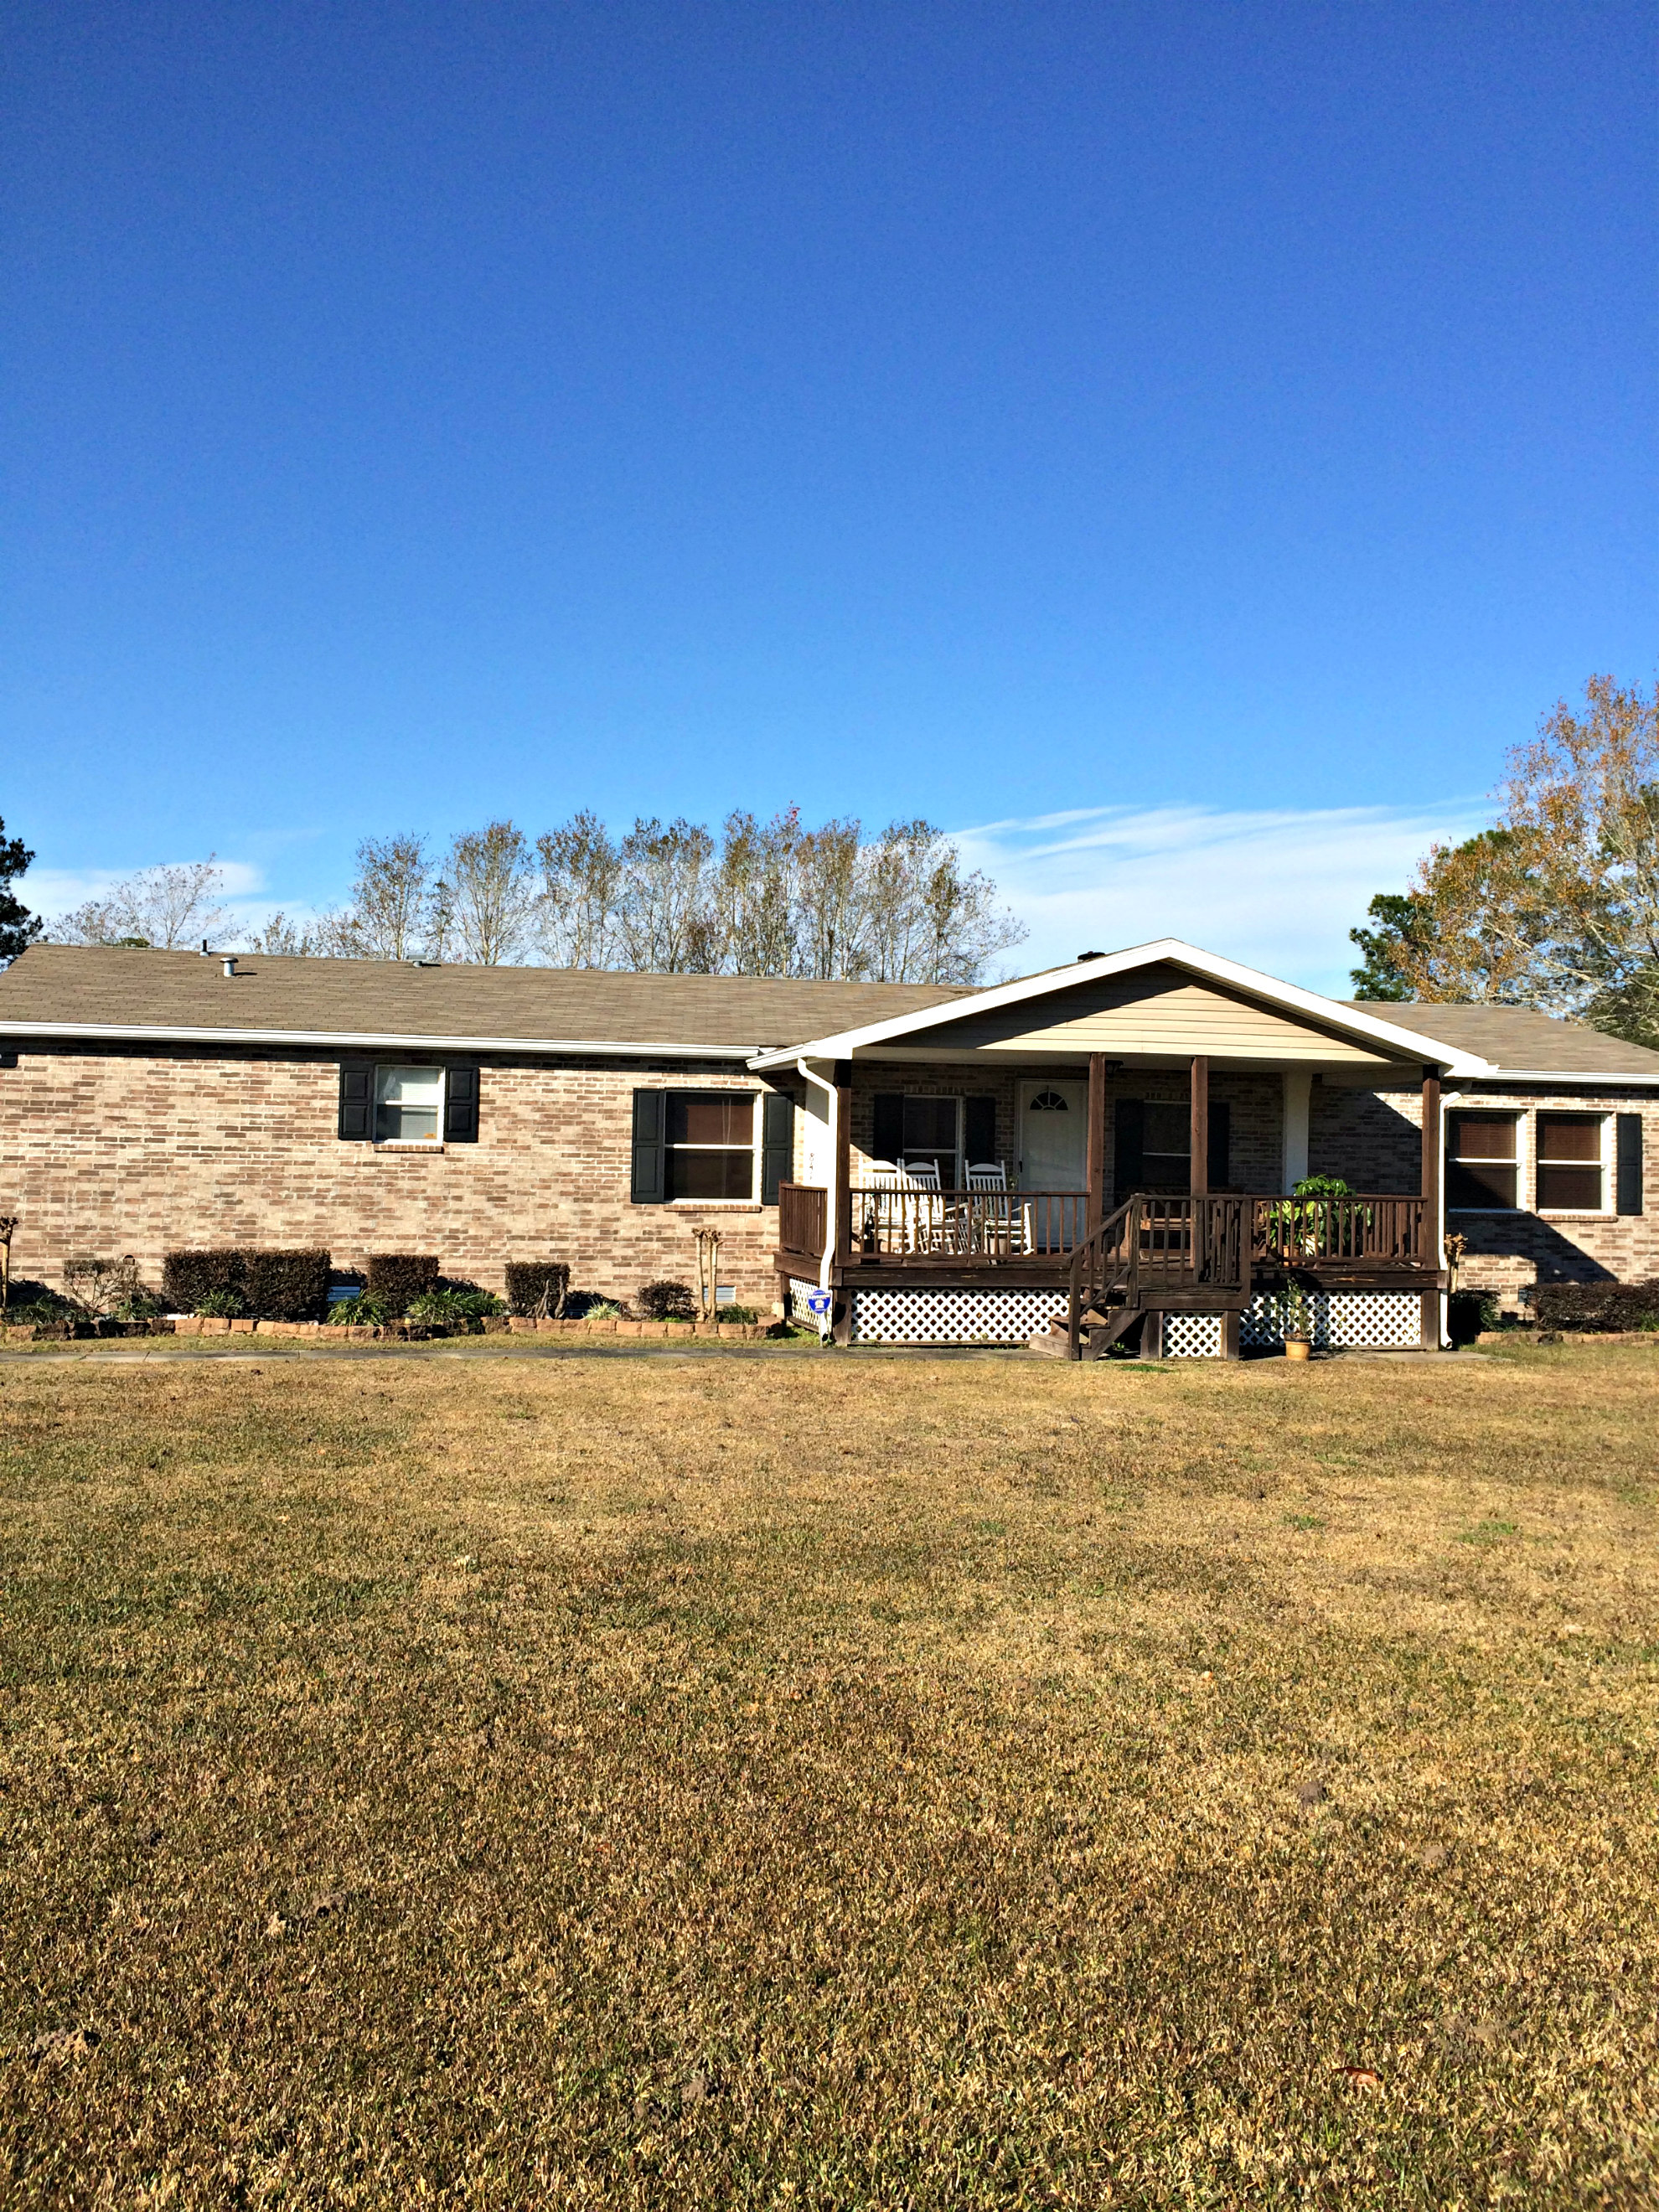 841 Hooks Rd., Dequincy, Louisiana 70633